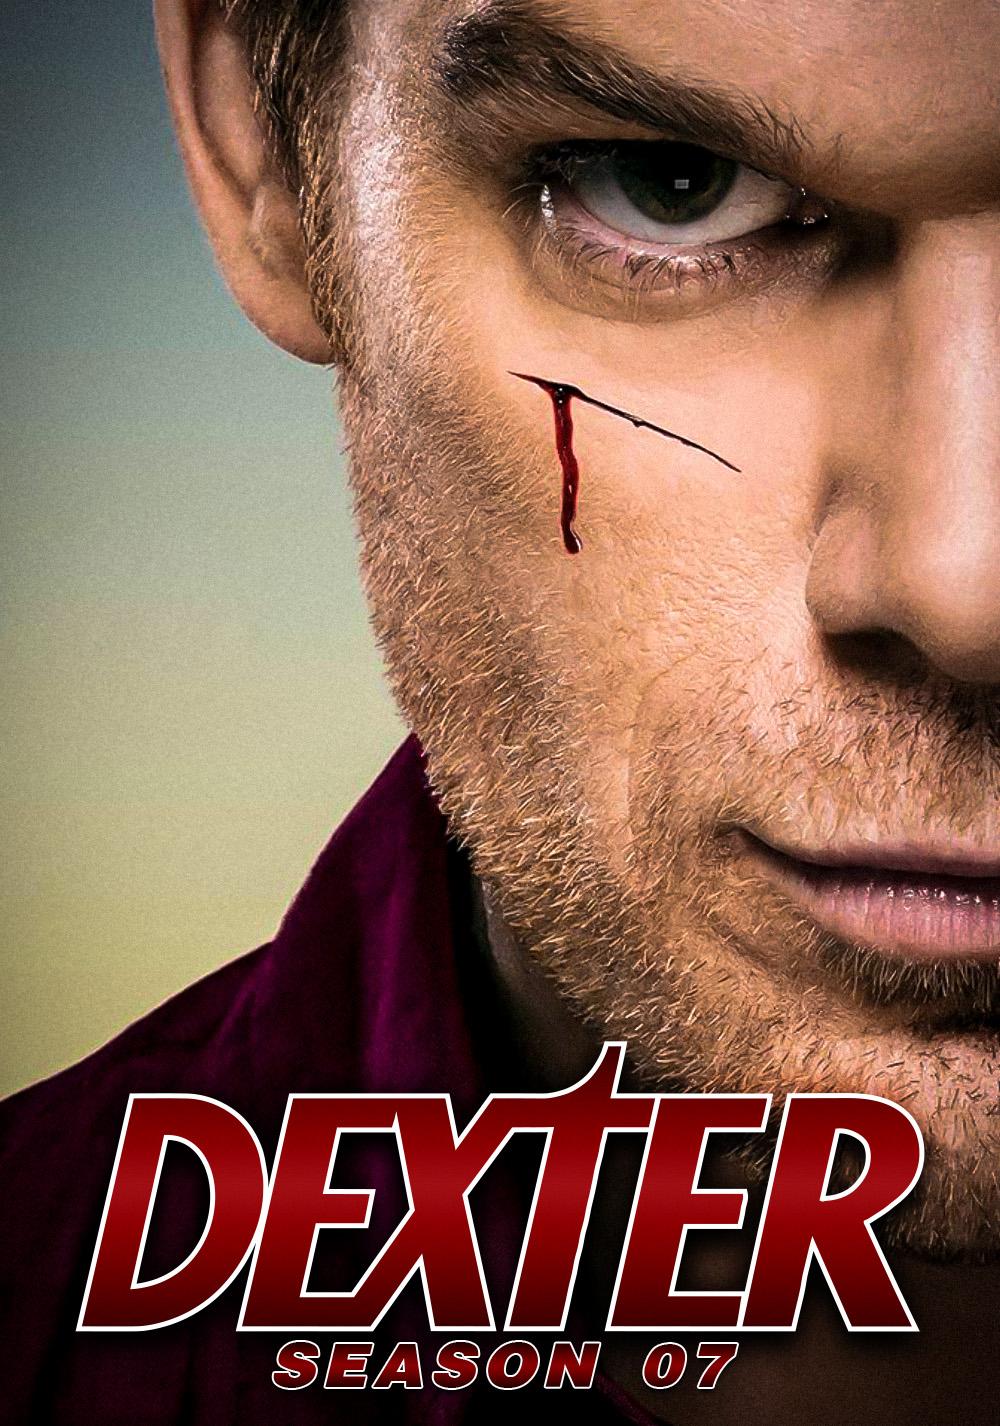 Dexter|Colección 1-8|Latino-Ingles|1080p|96/96|x265 10bit|+ Soundtracks  Season07-poster